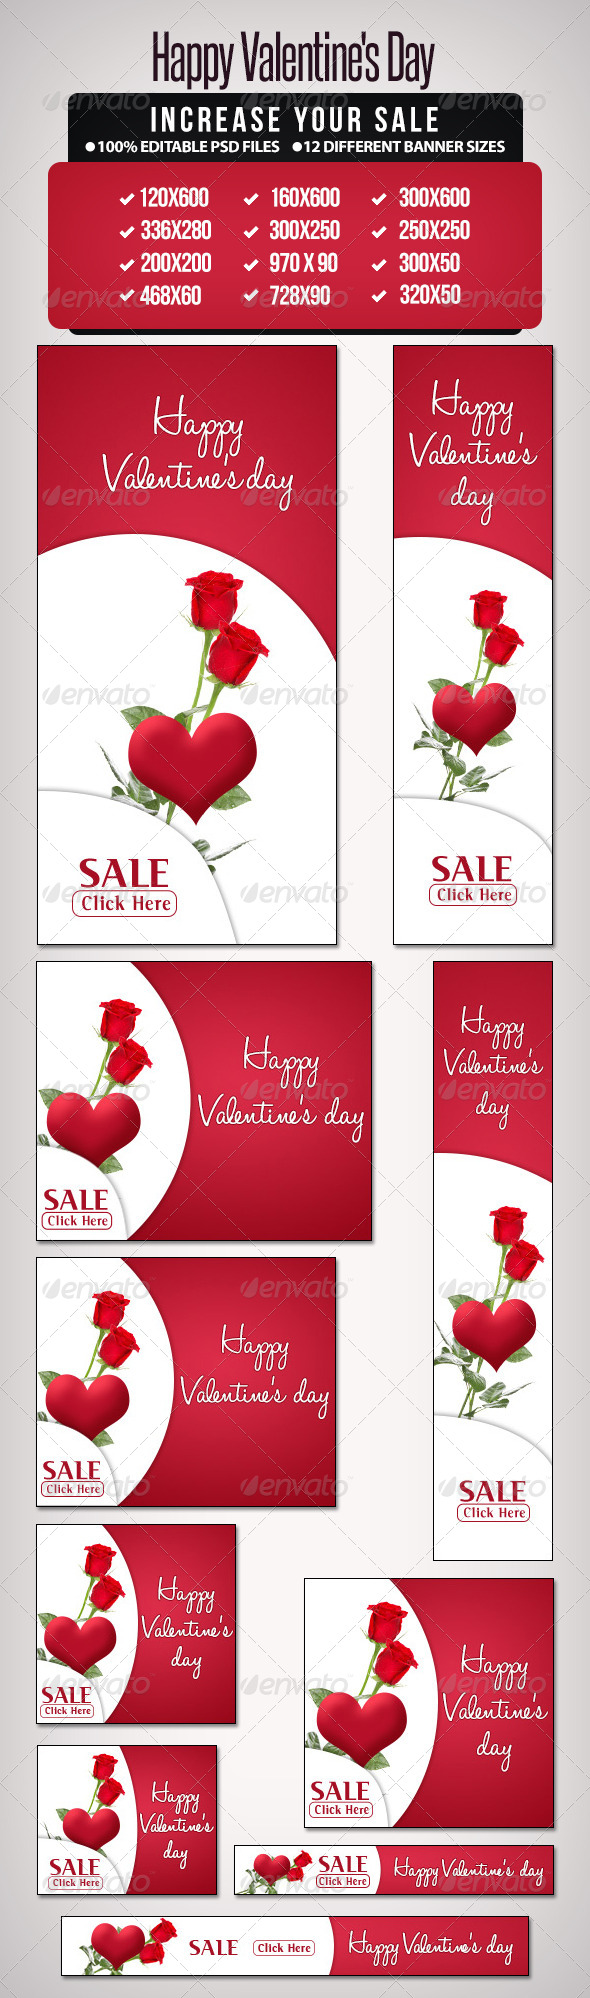 GraphicRiver Happy Valentine s Day 6710978